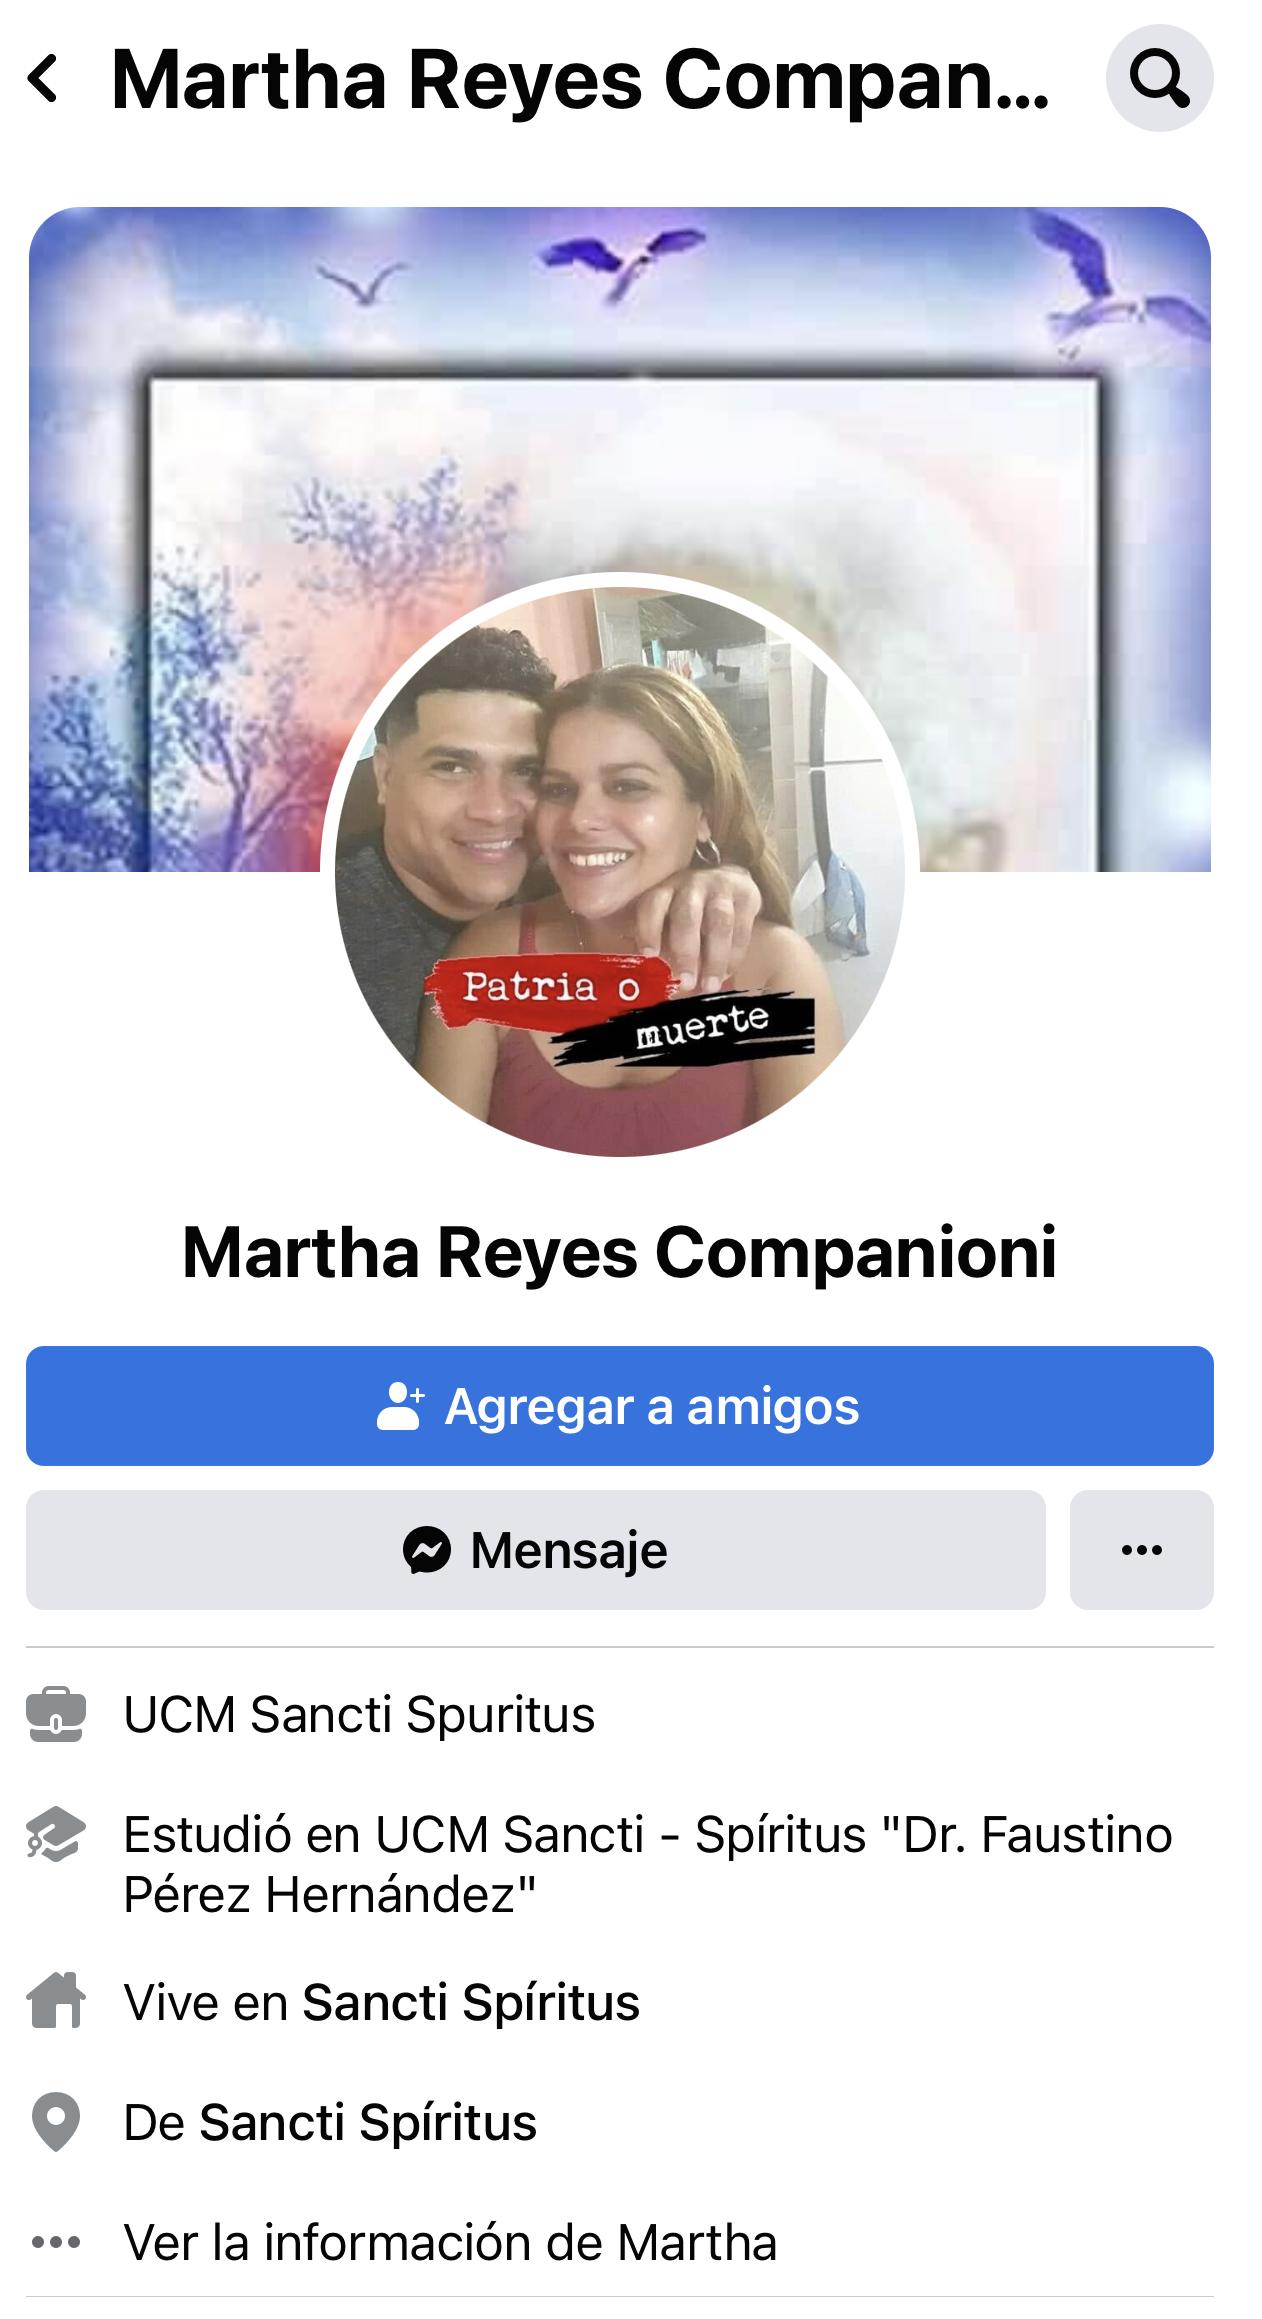 Martha Reyes Companioni